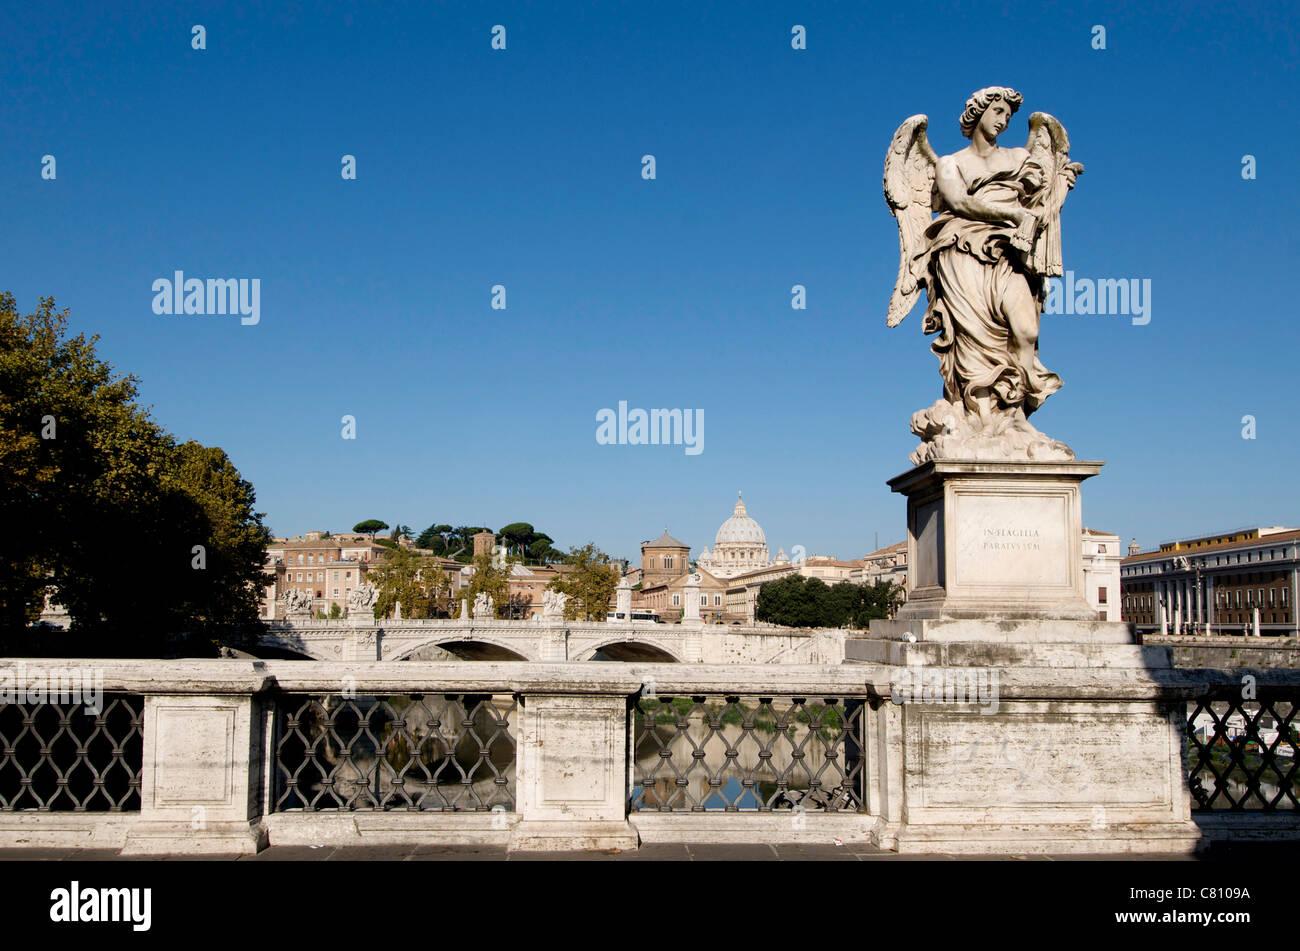 Bernini Statue on the Ponte Sant Angelo, River Tiber, Rome, Italy - Stock Image